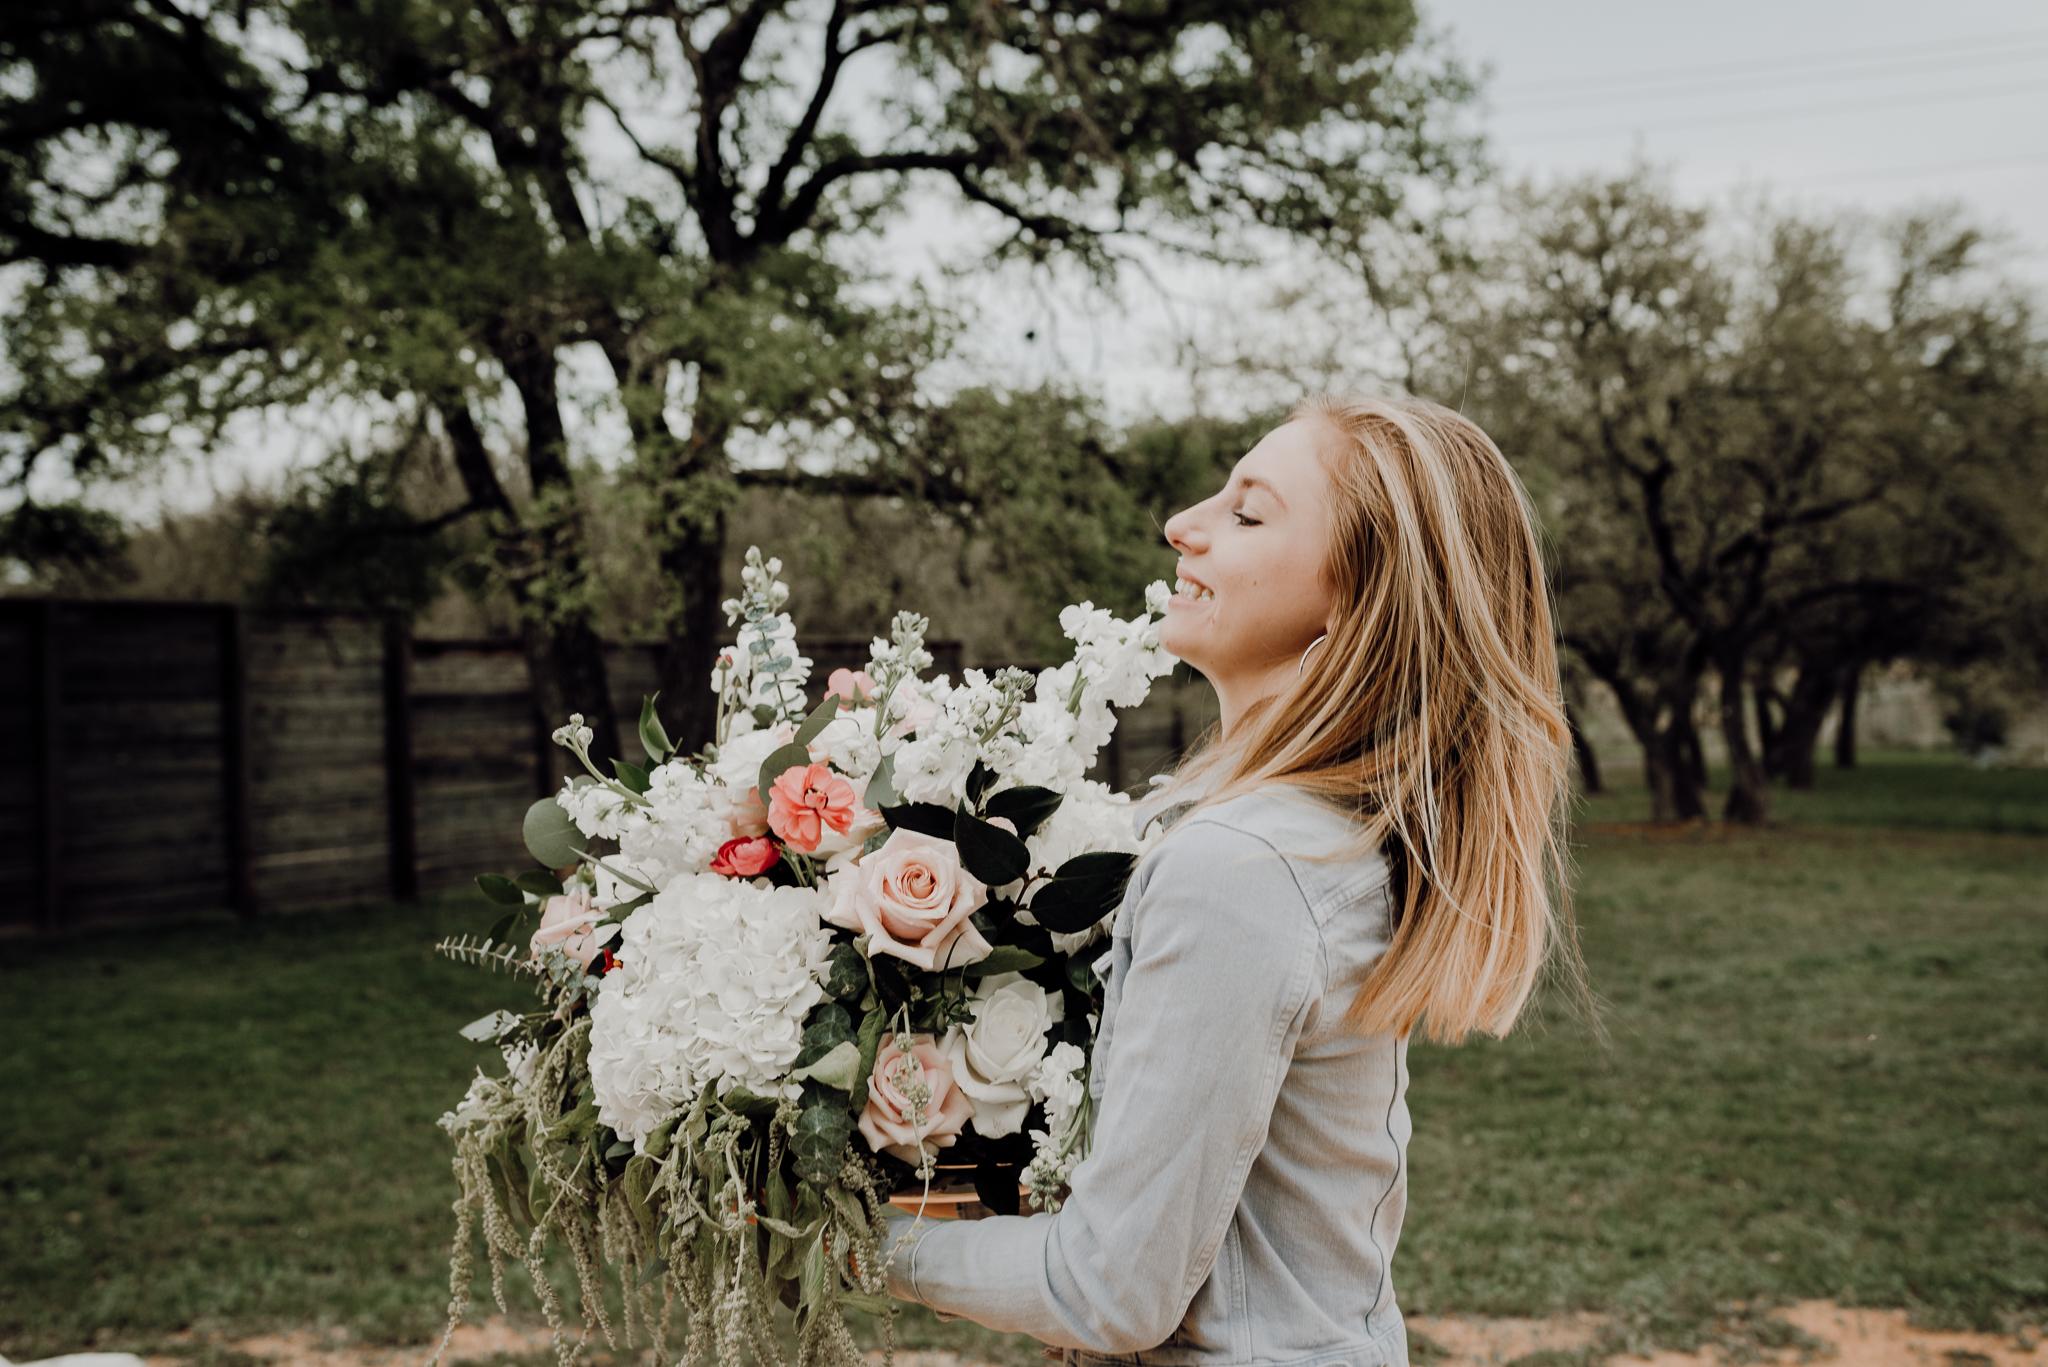 kristen giles photography | texas-wedding-elopement-photographer-Duchman Winery-Austin TX-19-blog.jpg